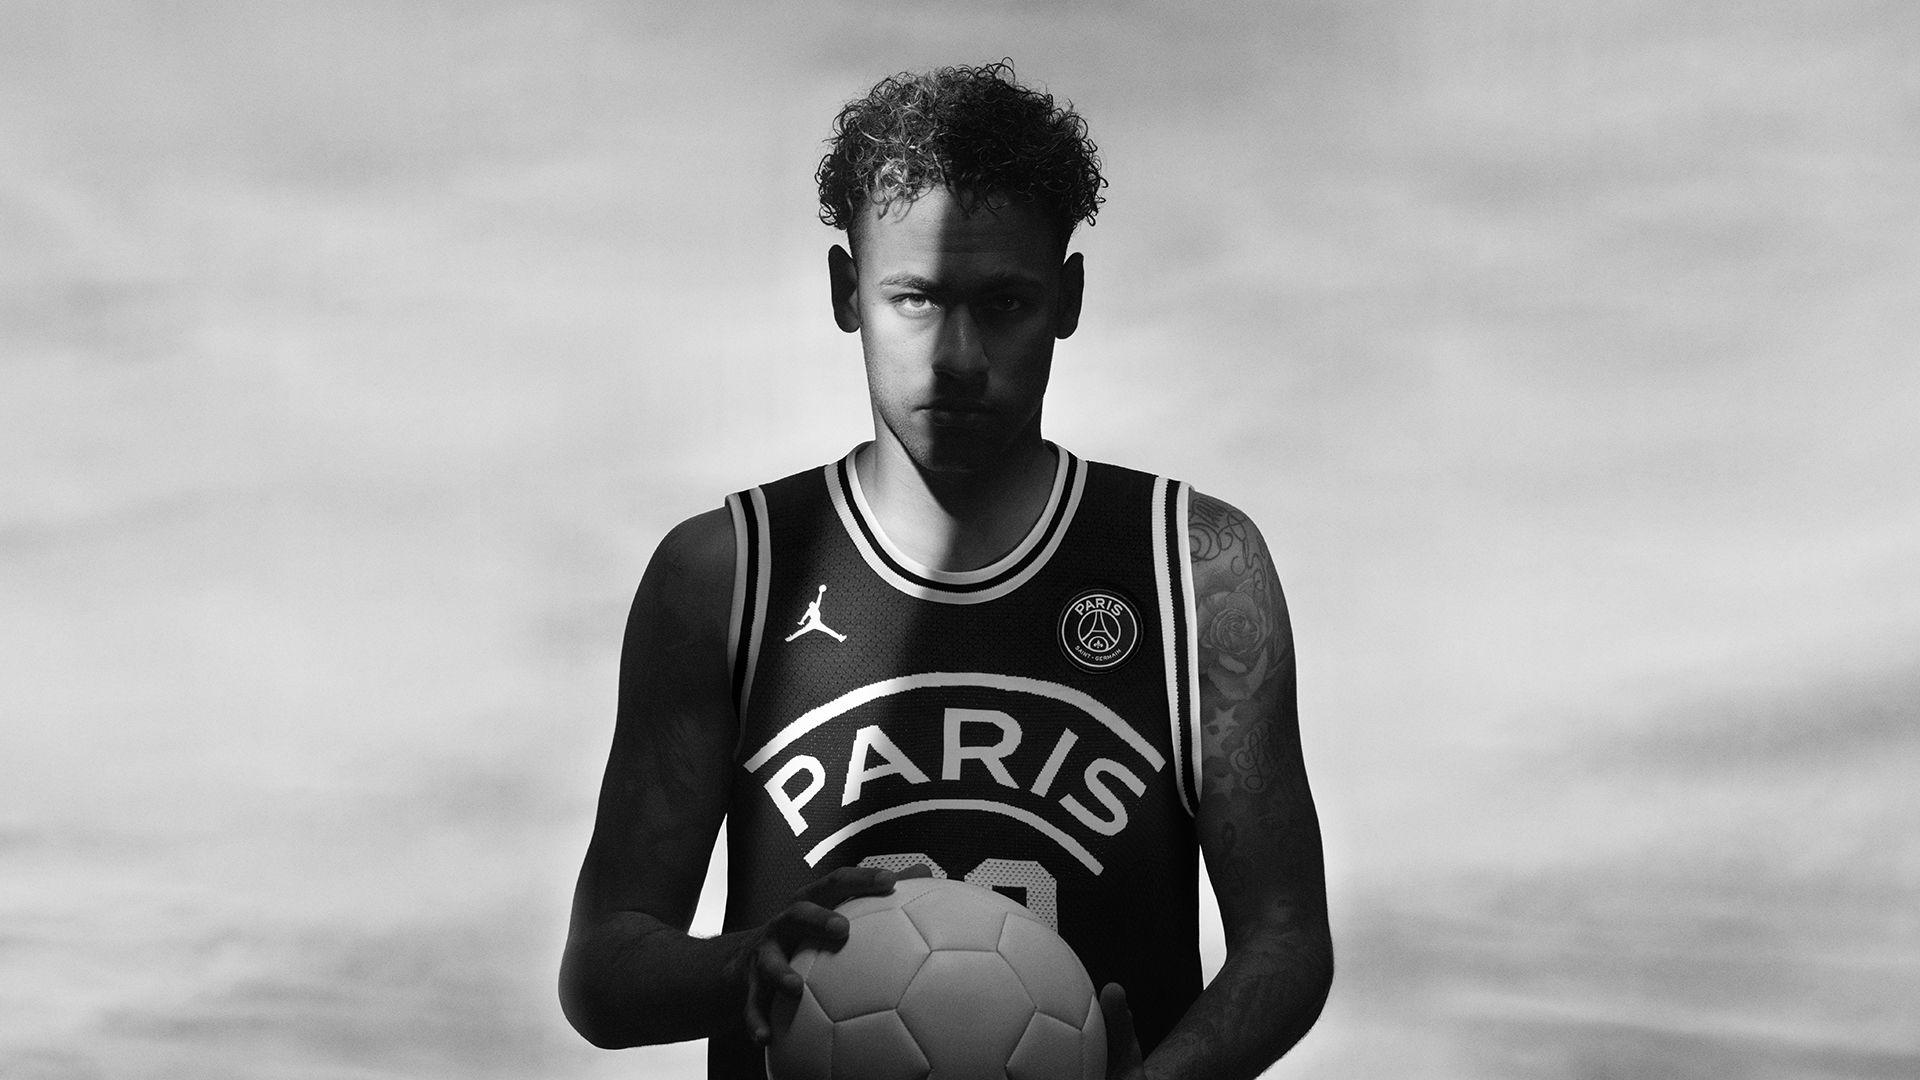 Camiseta Básquetbol Jordan X Saint GermainPr Paris De nOwNvm80